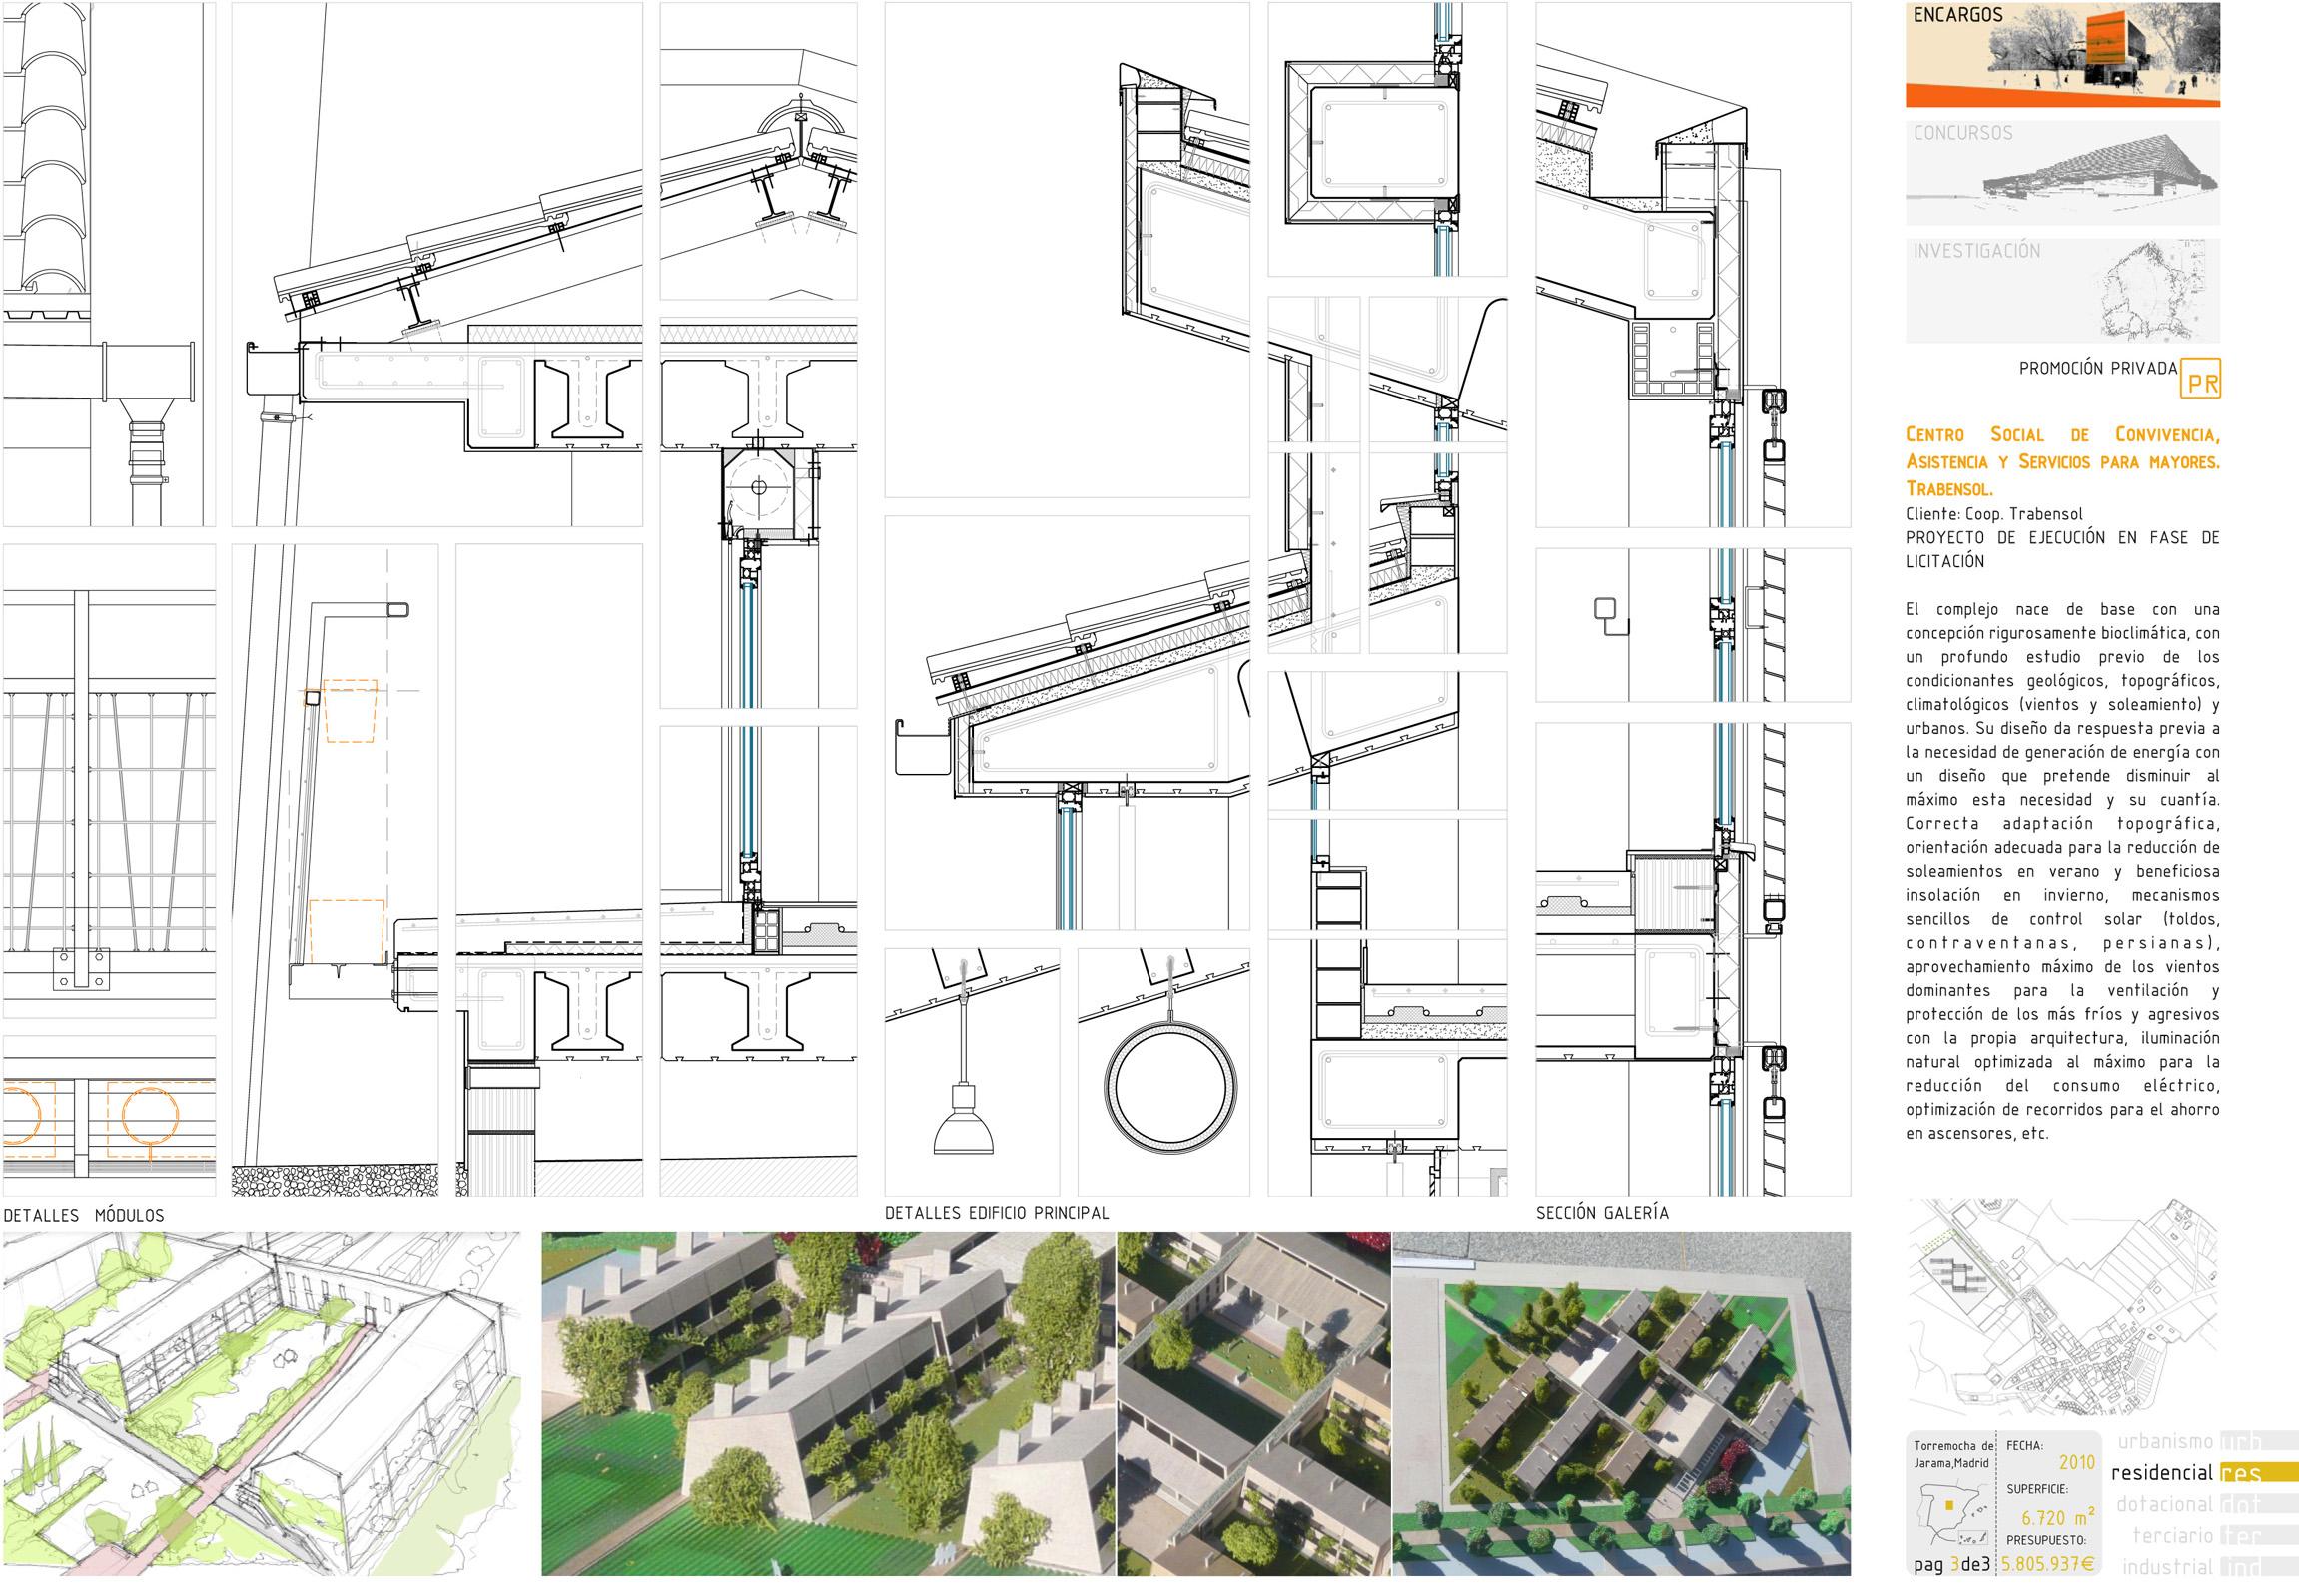 Ecohousing proyecto de arquitectura del centro de mayores for Arquitectura de proyectos